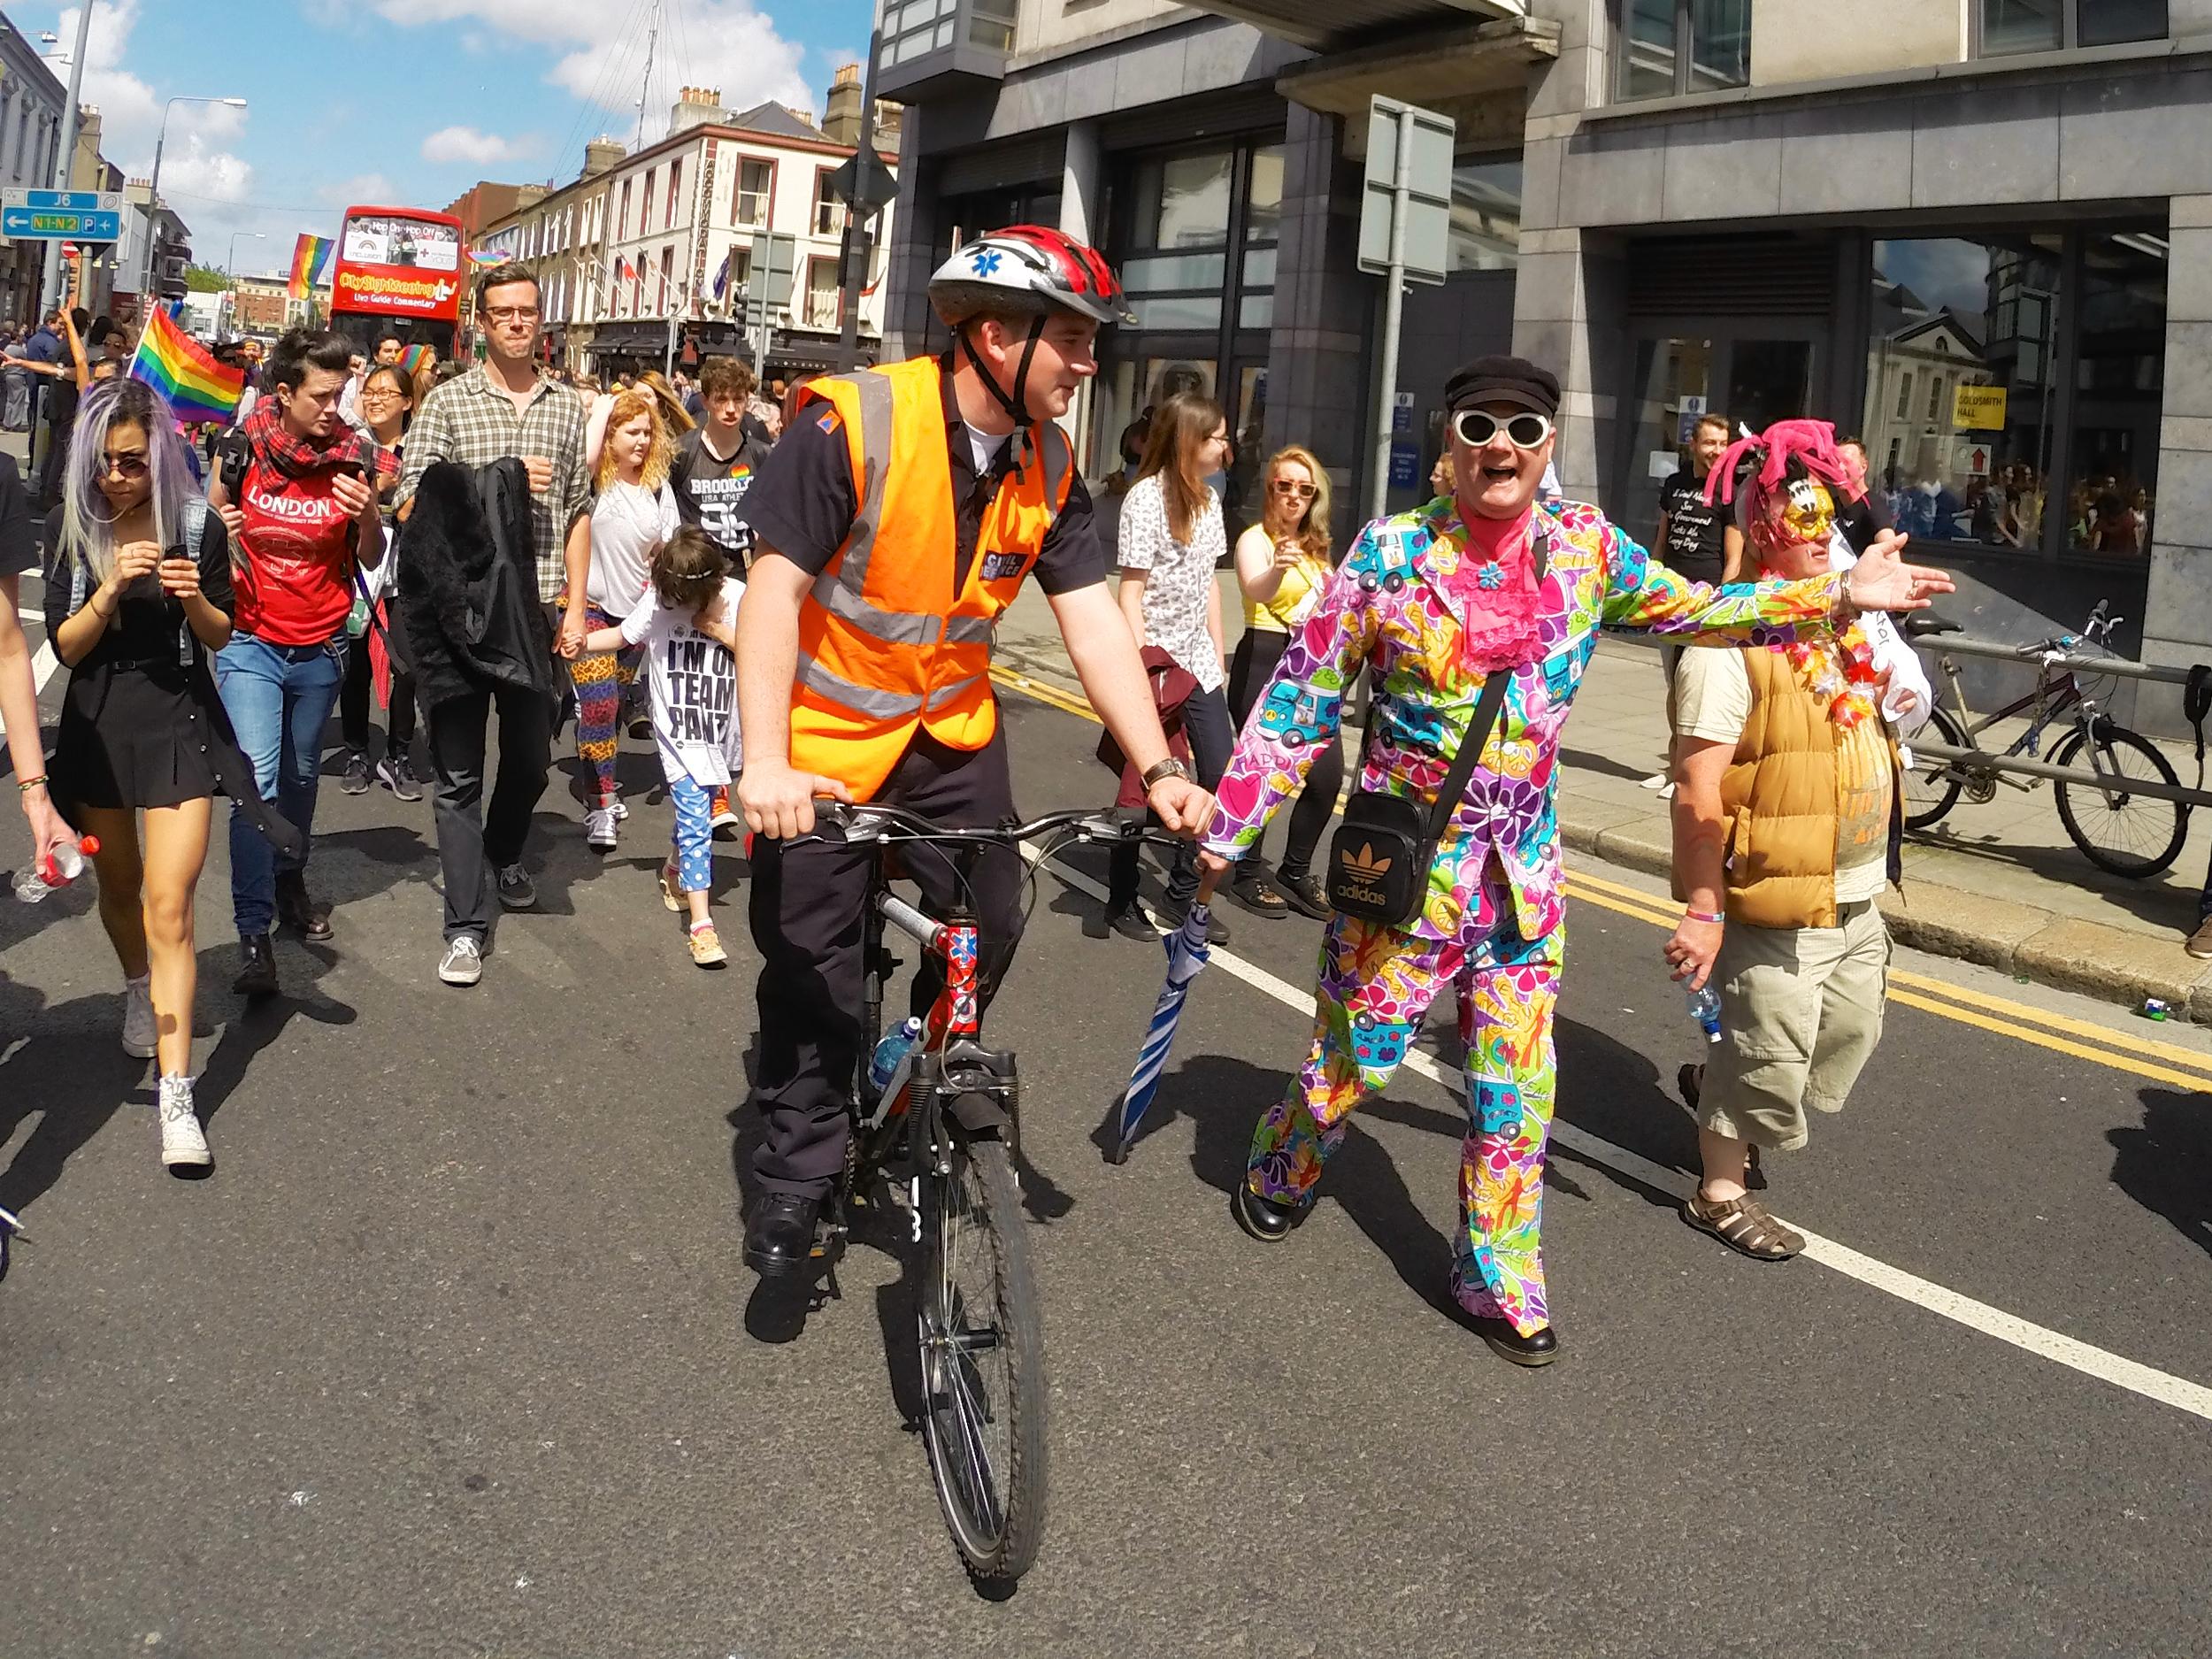 Medical Bikes at the Dublin Pride festival 2014